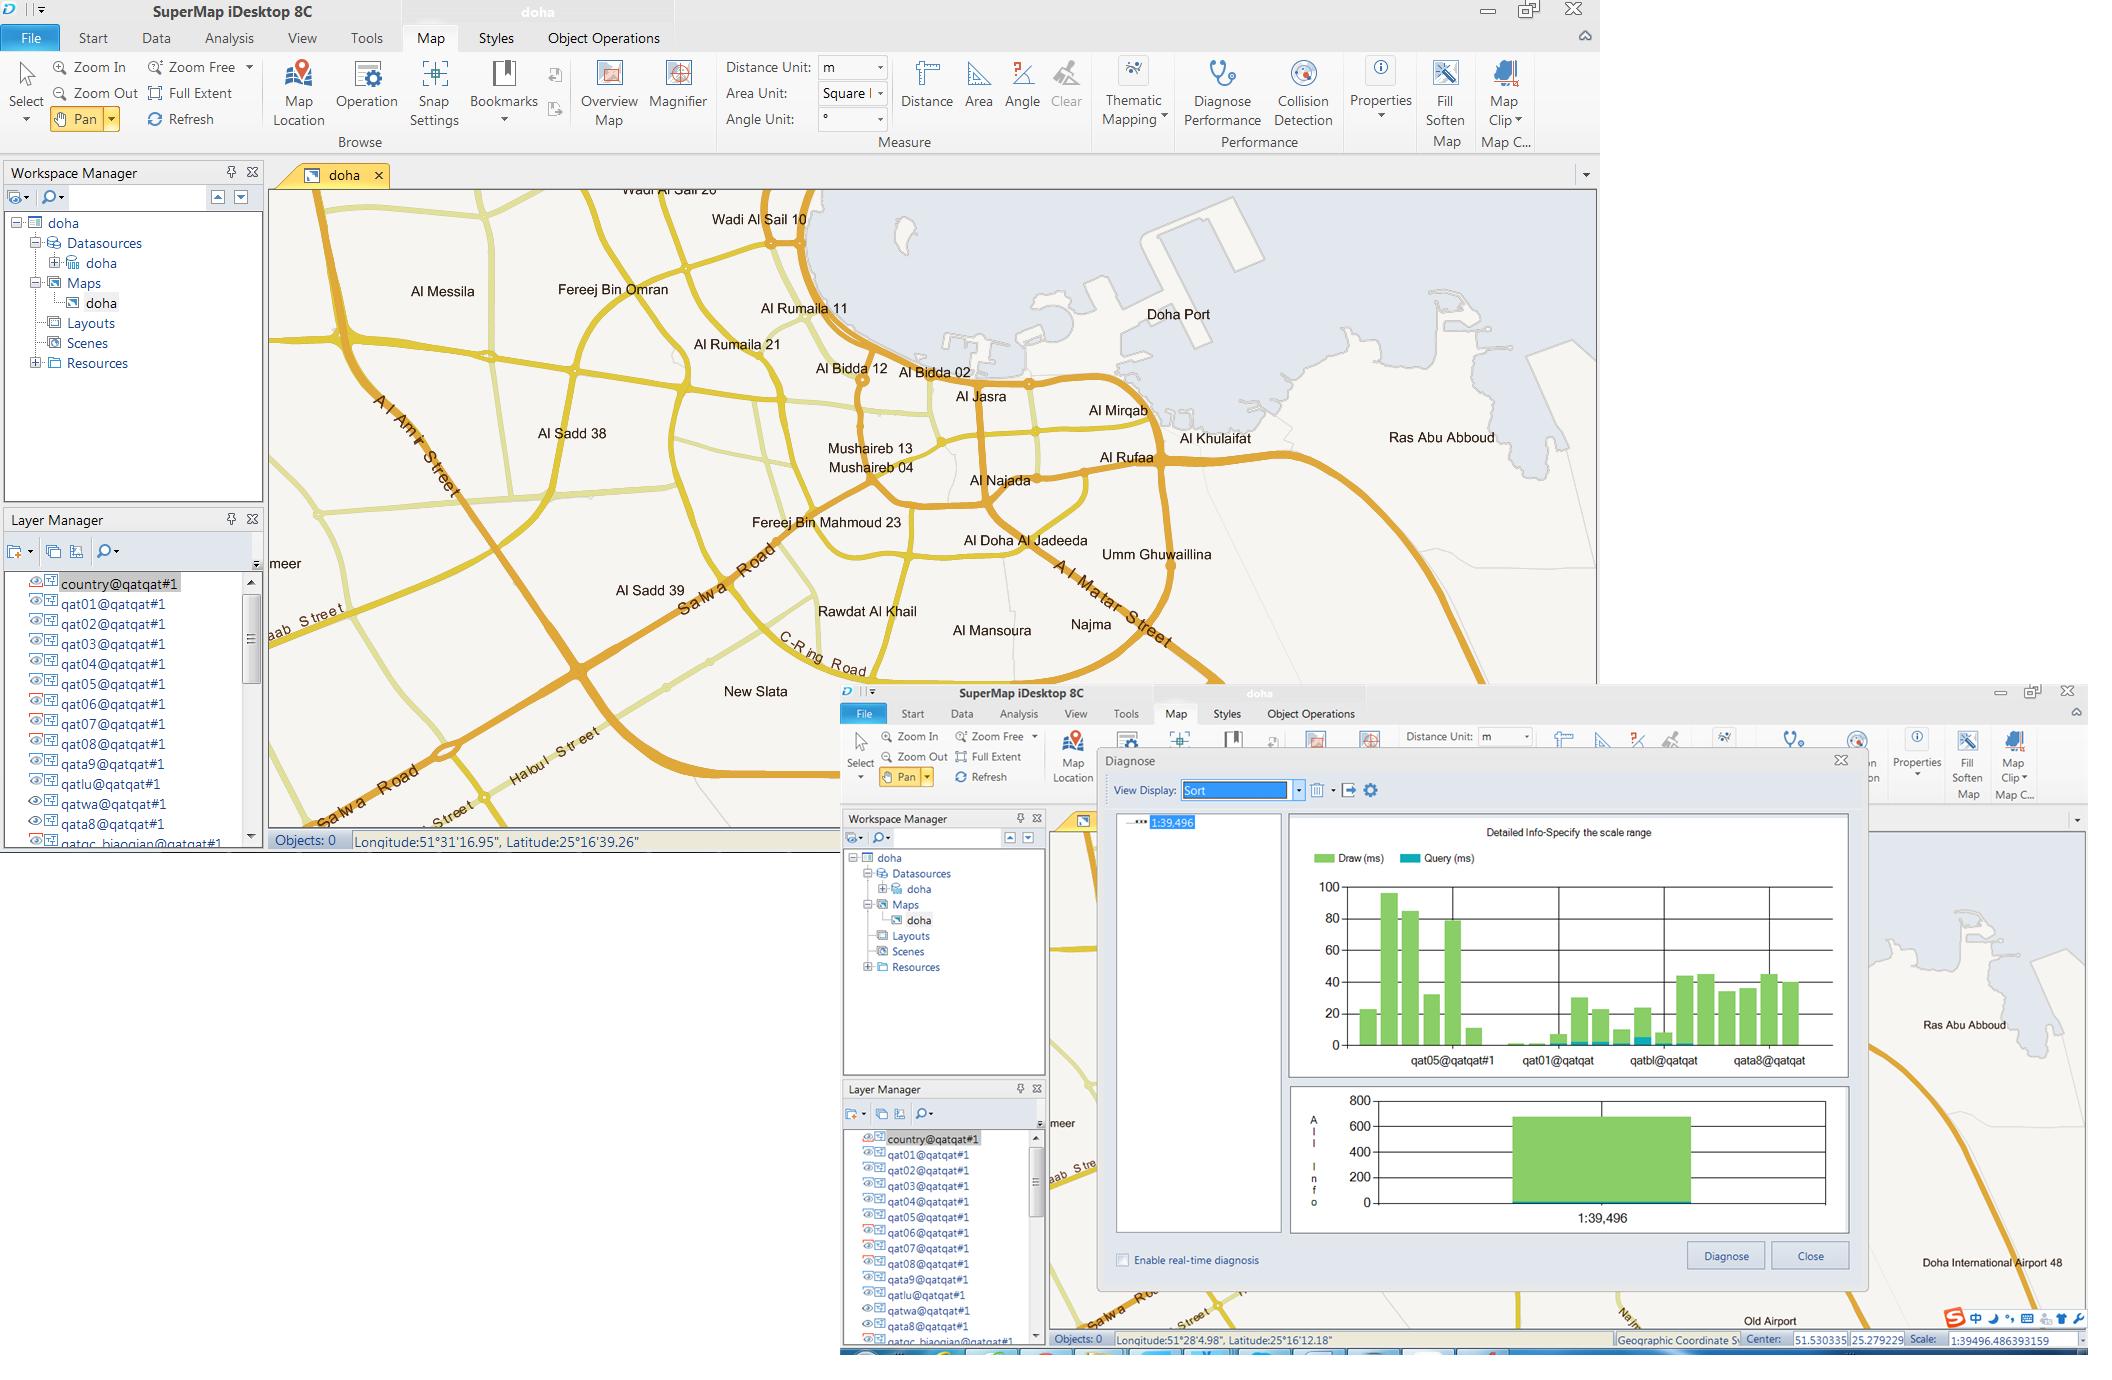 SuperMap GIS 8C_GIS Platform for Client_Desktop GIS